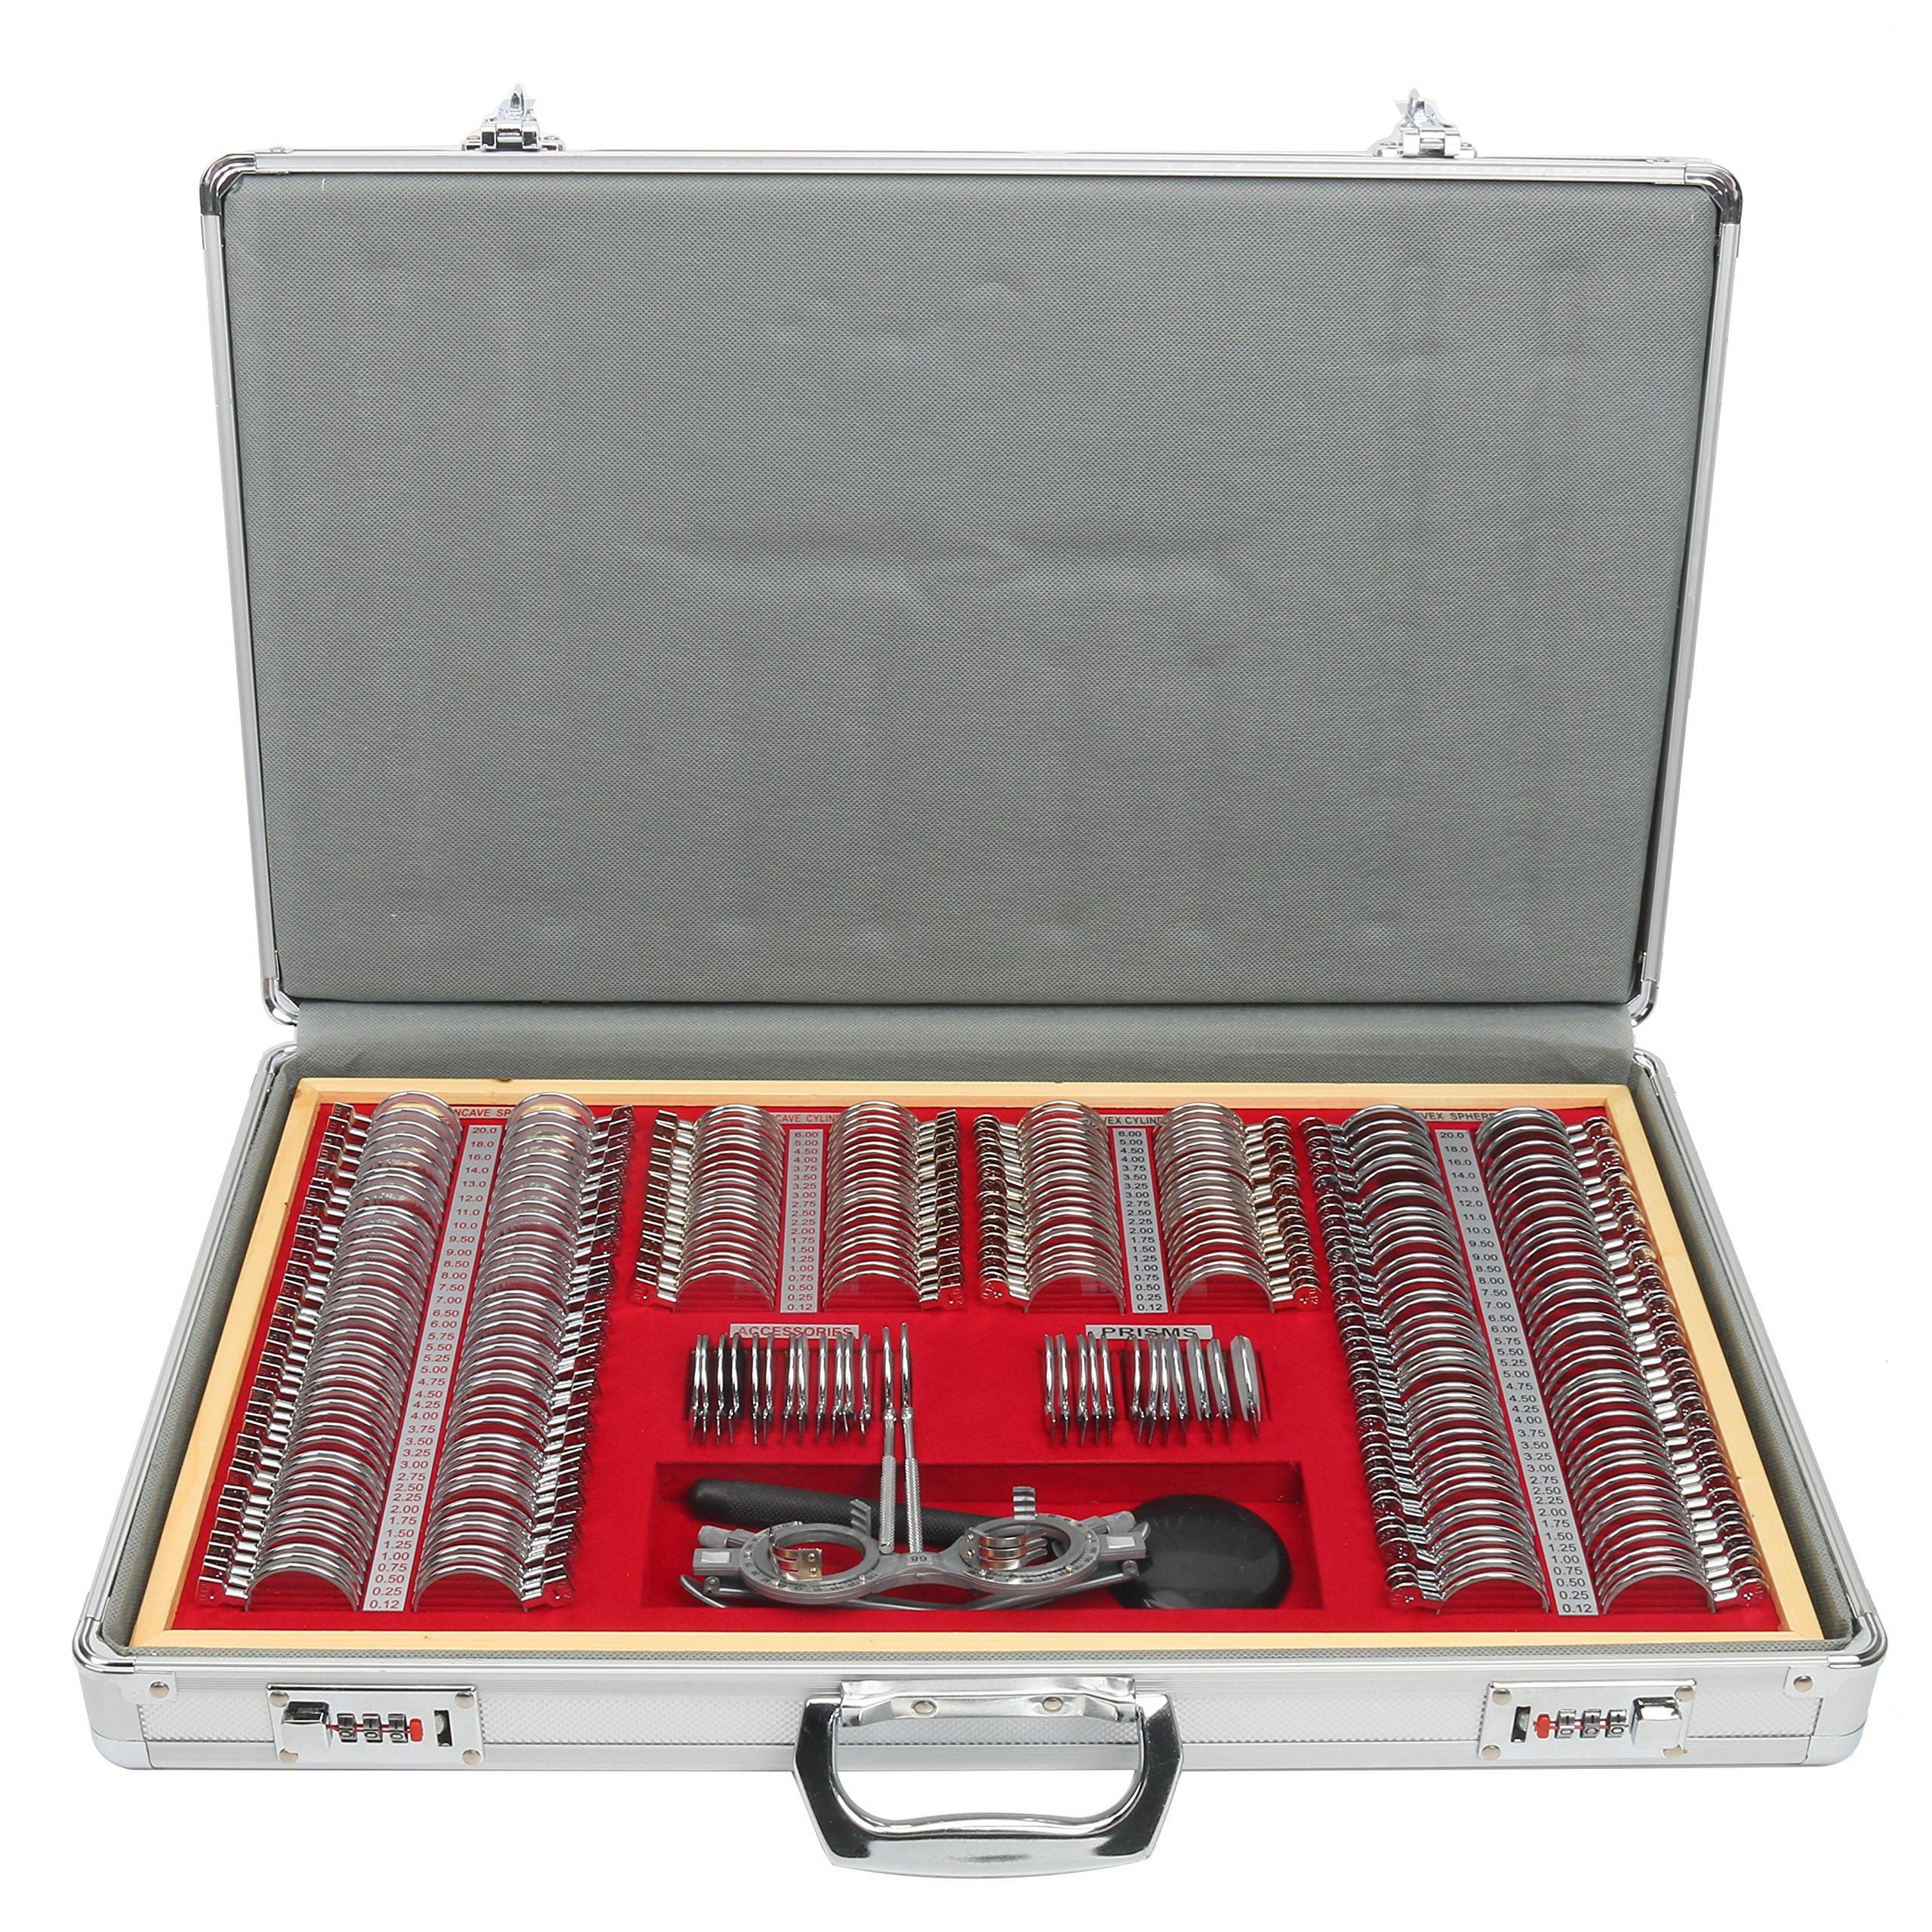 Yaegoo Optical Trial Lens Set Metal Rim Ophthalmic Trial case lenses with Aluminum Case (266-Lens Set-Metal Rim)